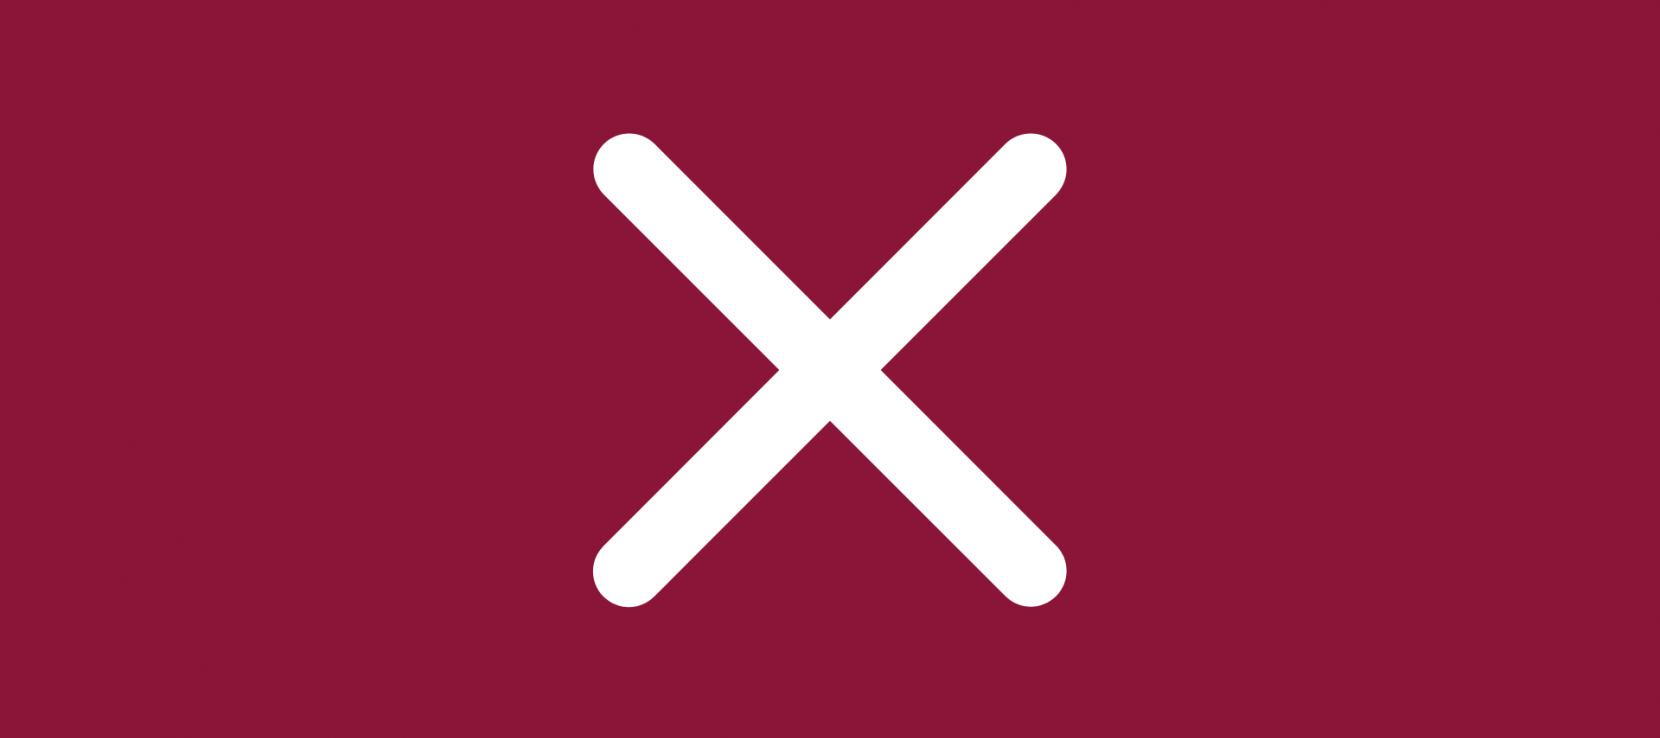 Croix blanche